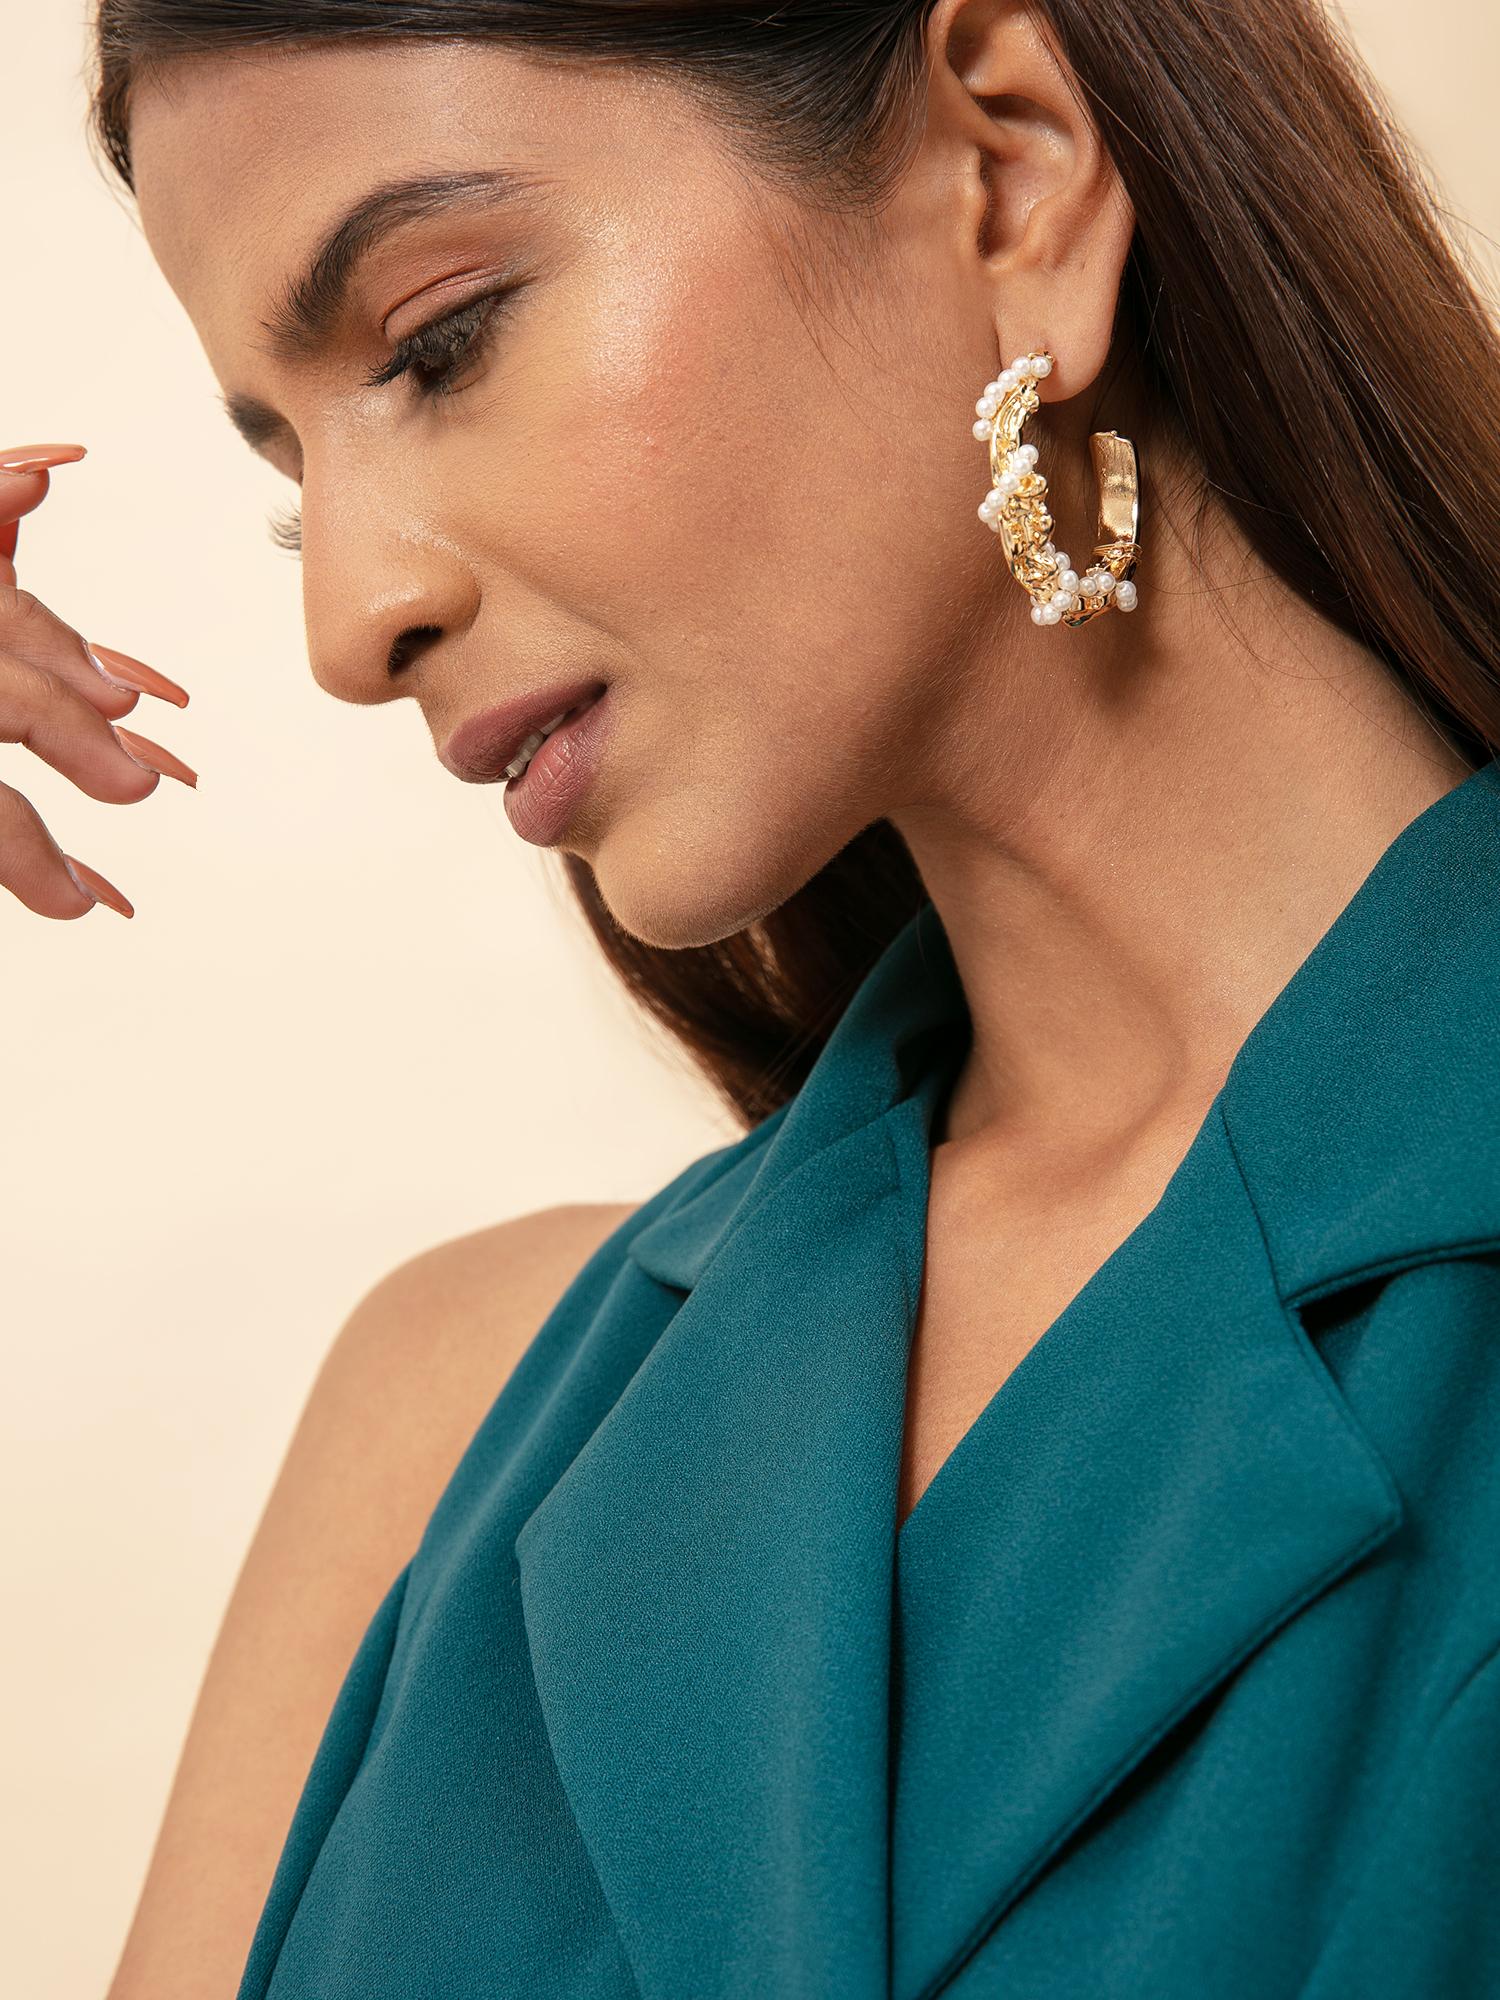 Earrings-The Perfect Pearl Earrings1